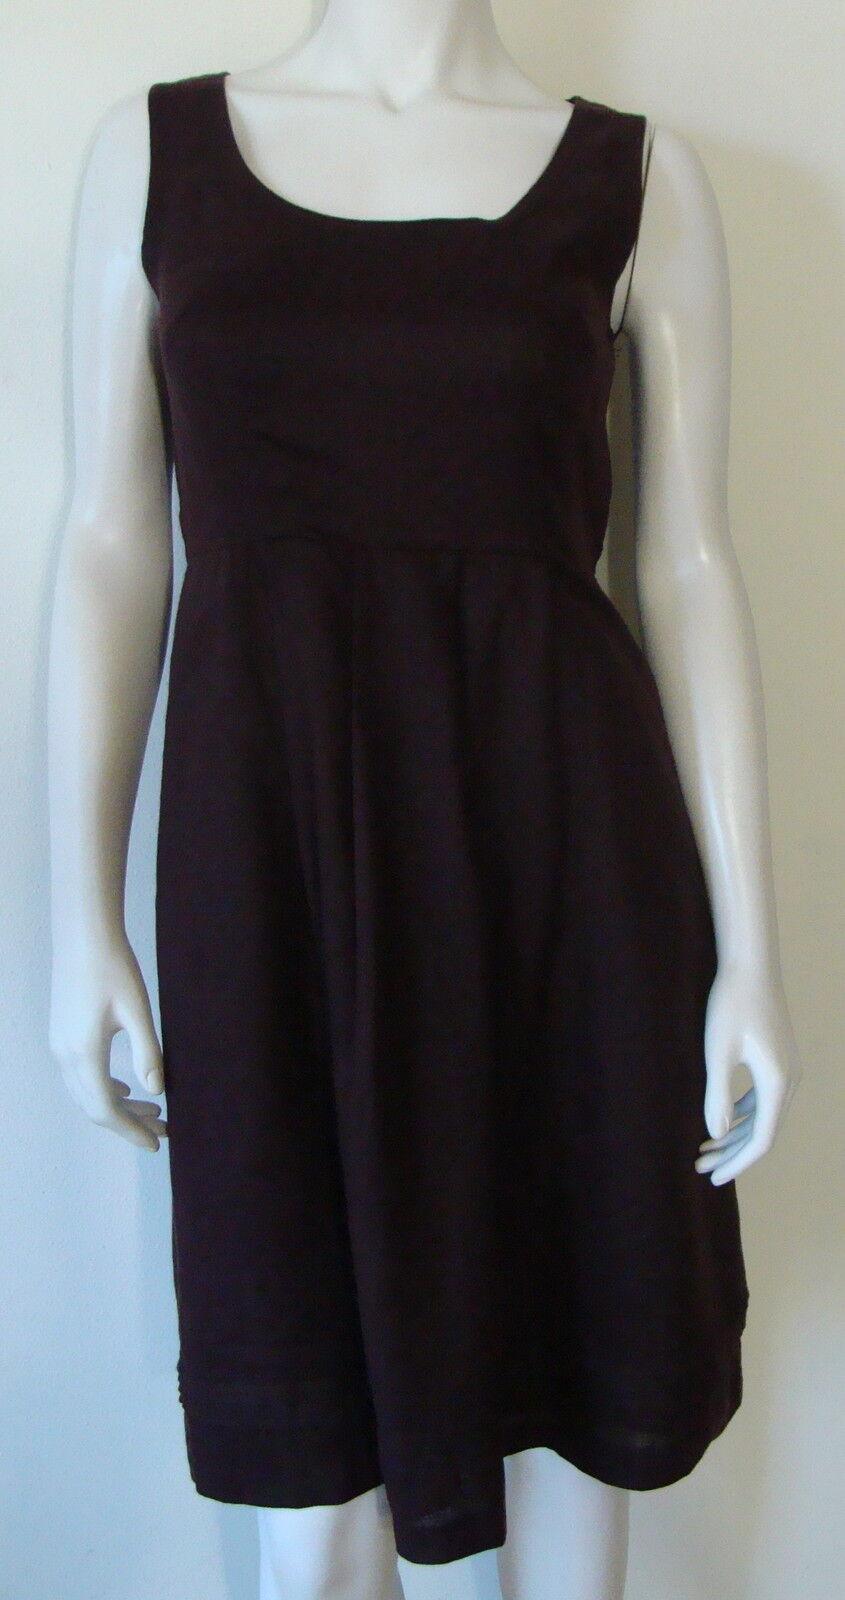 BANANA REPUBLIC Brown Sleeveless Dress below Knee 100% Linen 3 Pleat Front Sz 4